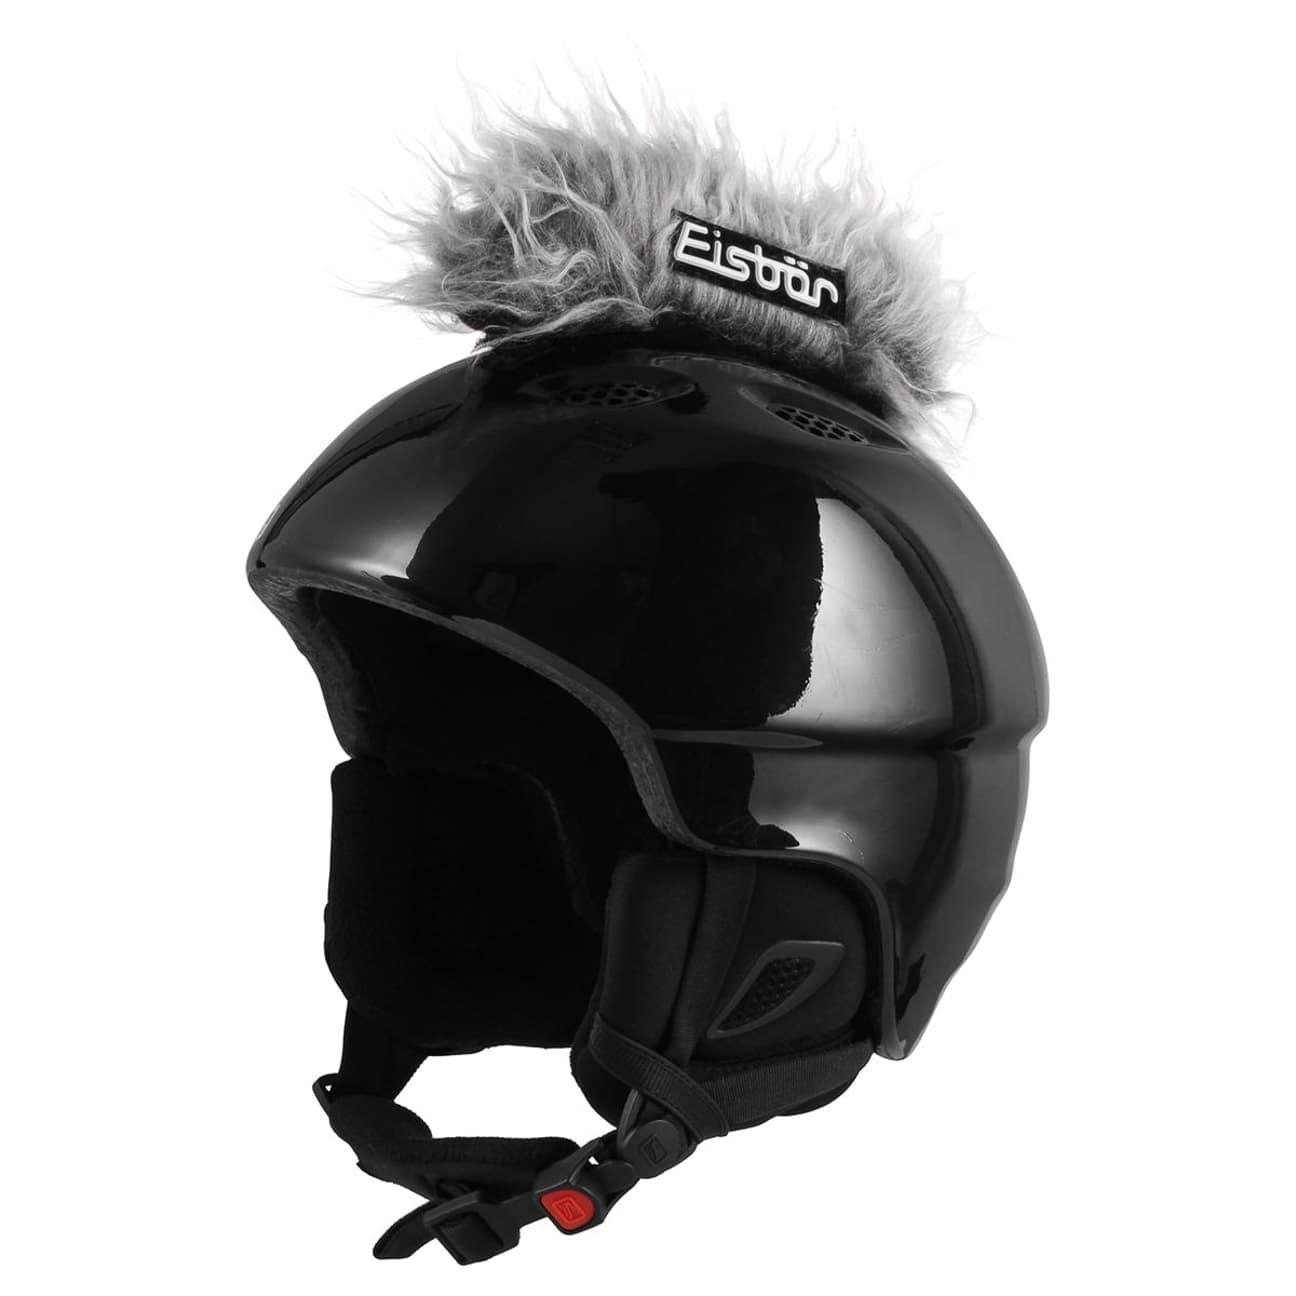 Autocollant Coiffure Iro by Eisbär casque de skieur